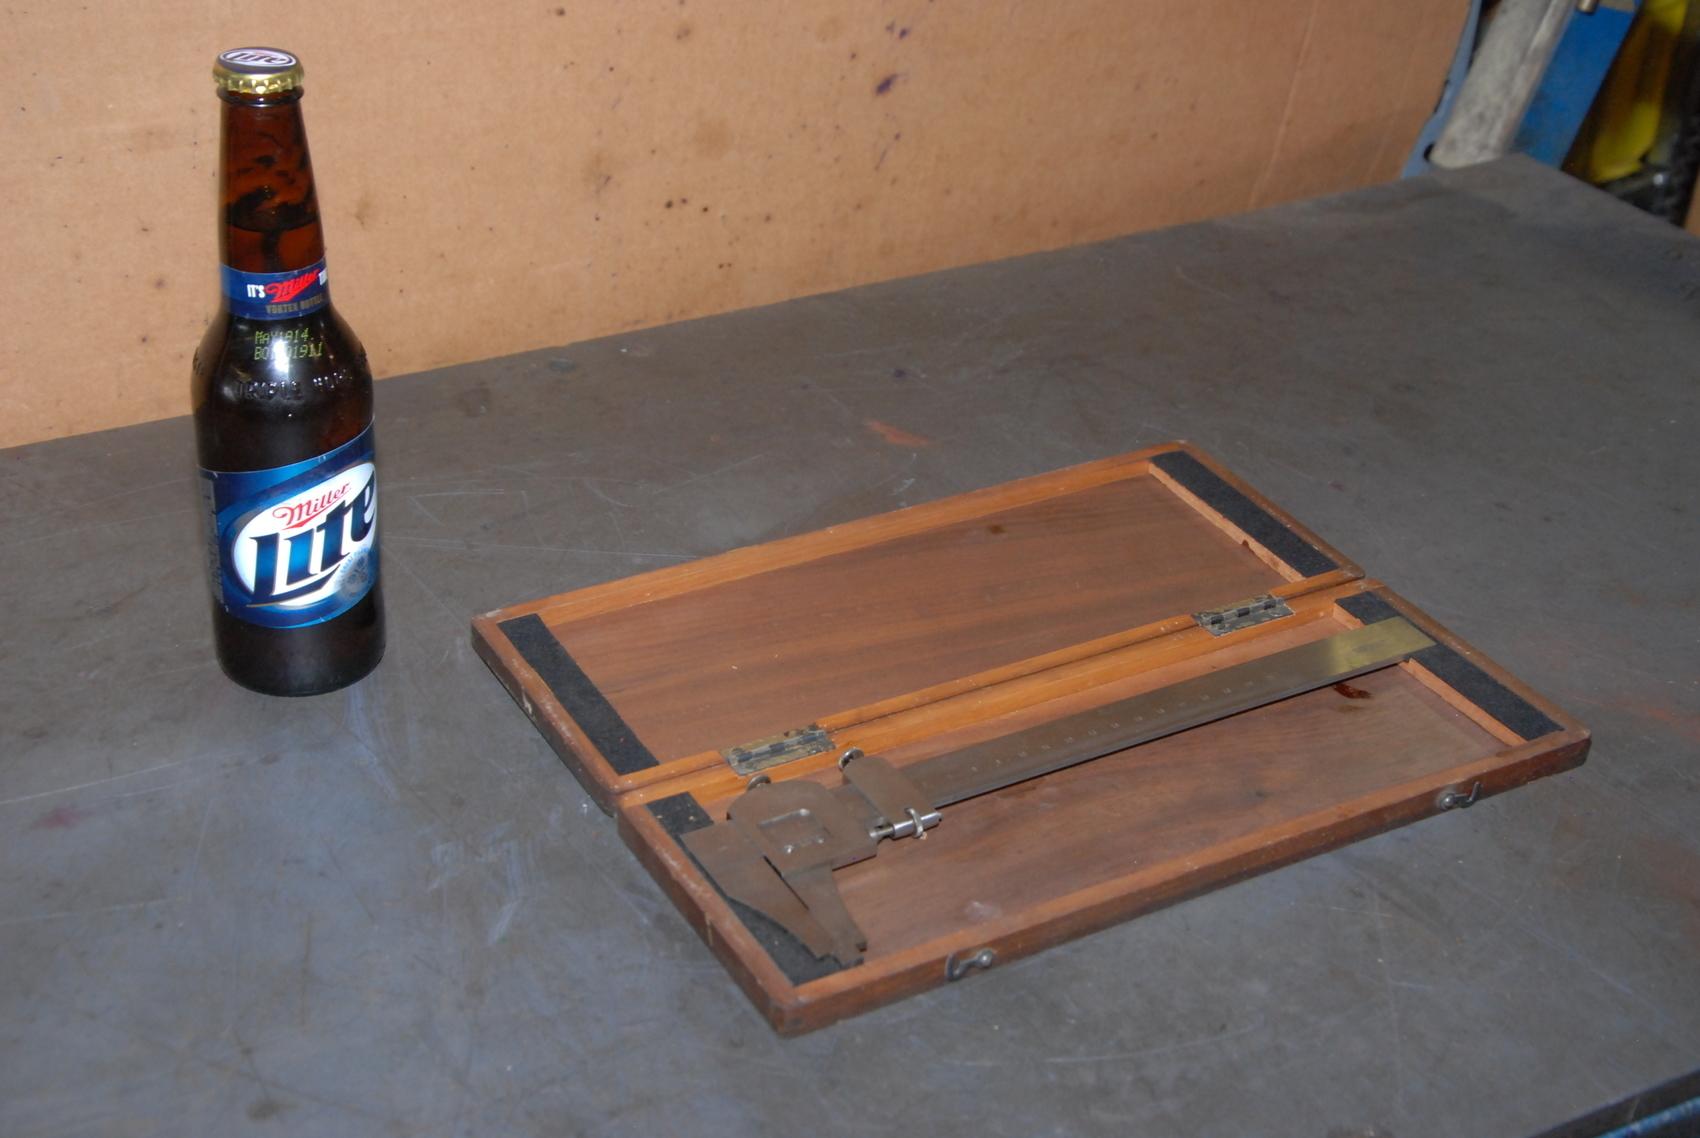 Vintage Jansson Gage Co 21cm metric Vernier Caliper in wooden case